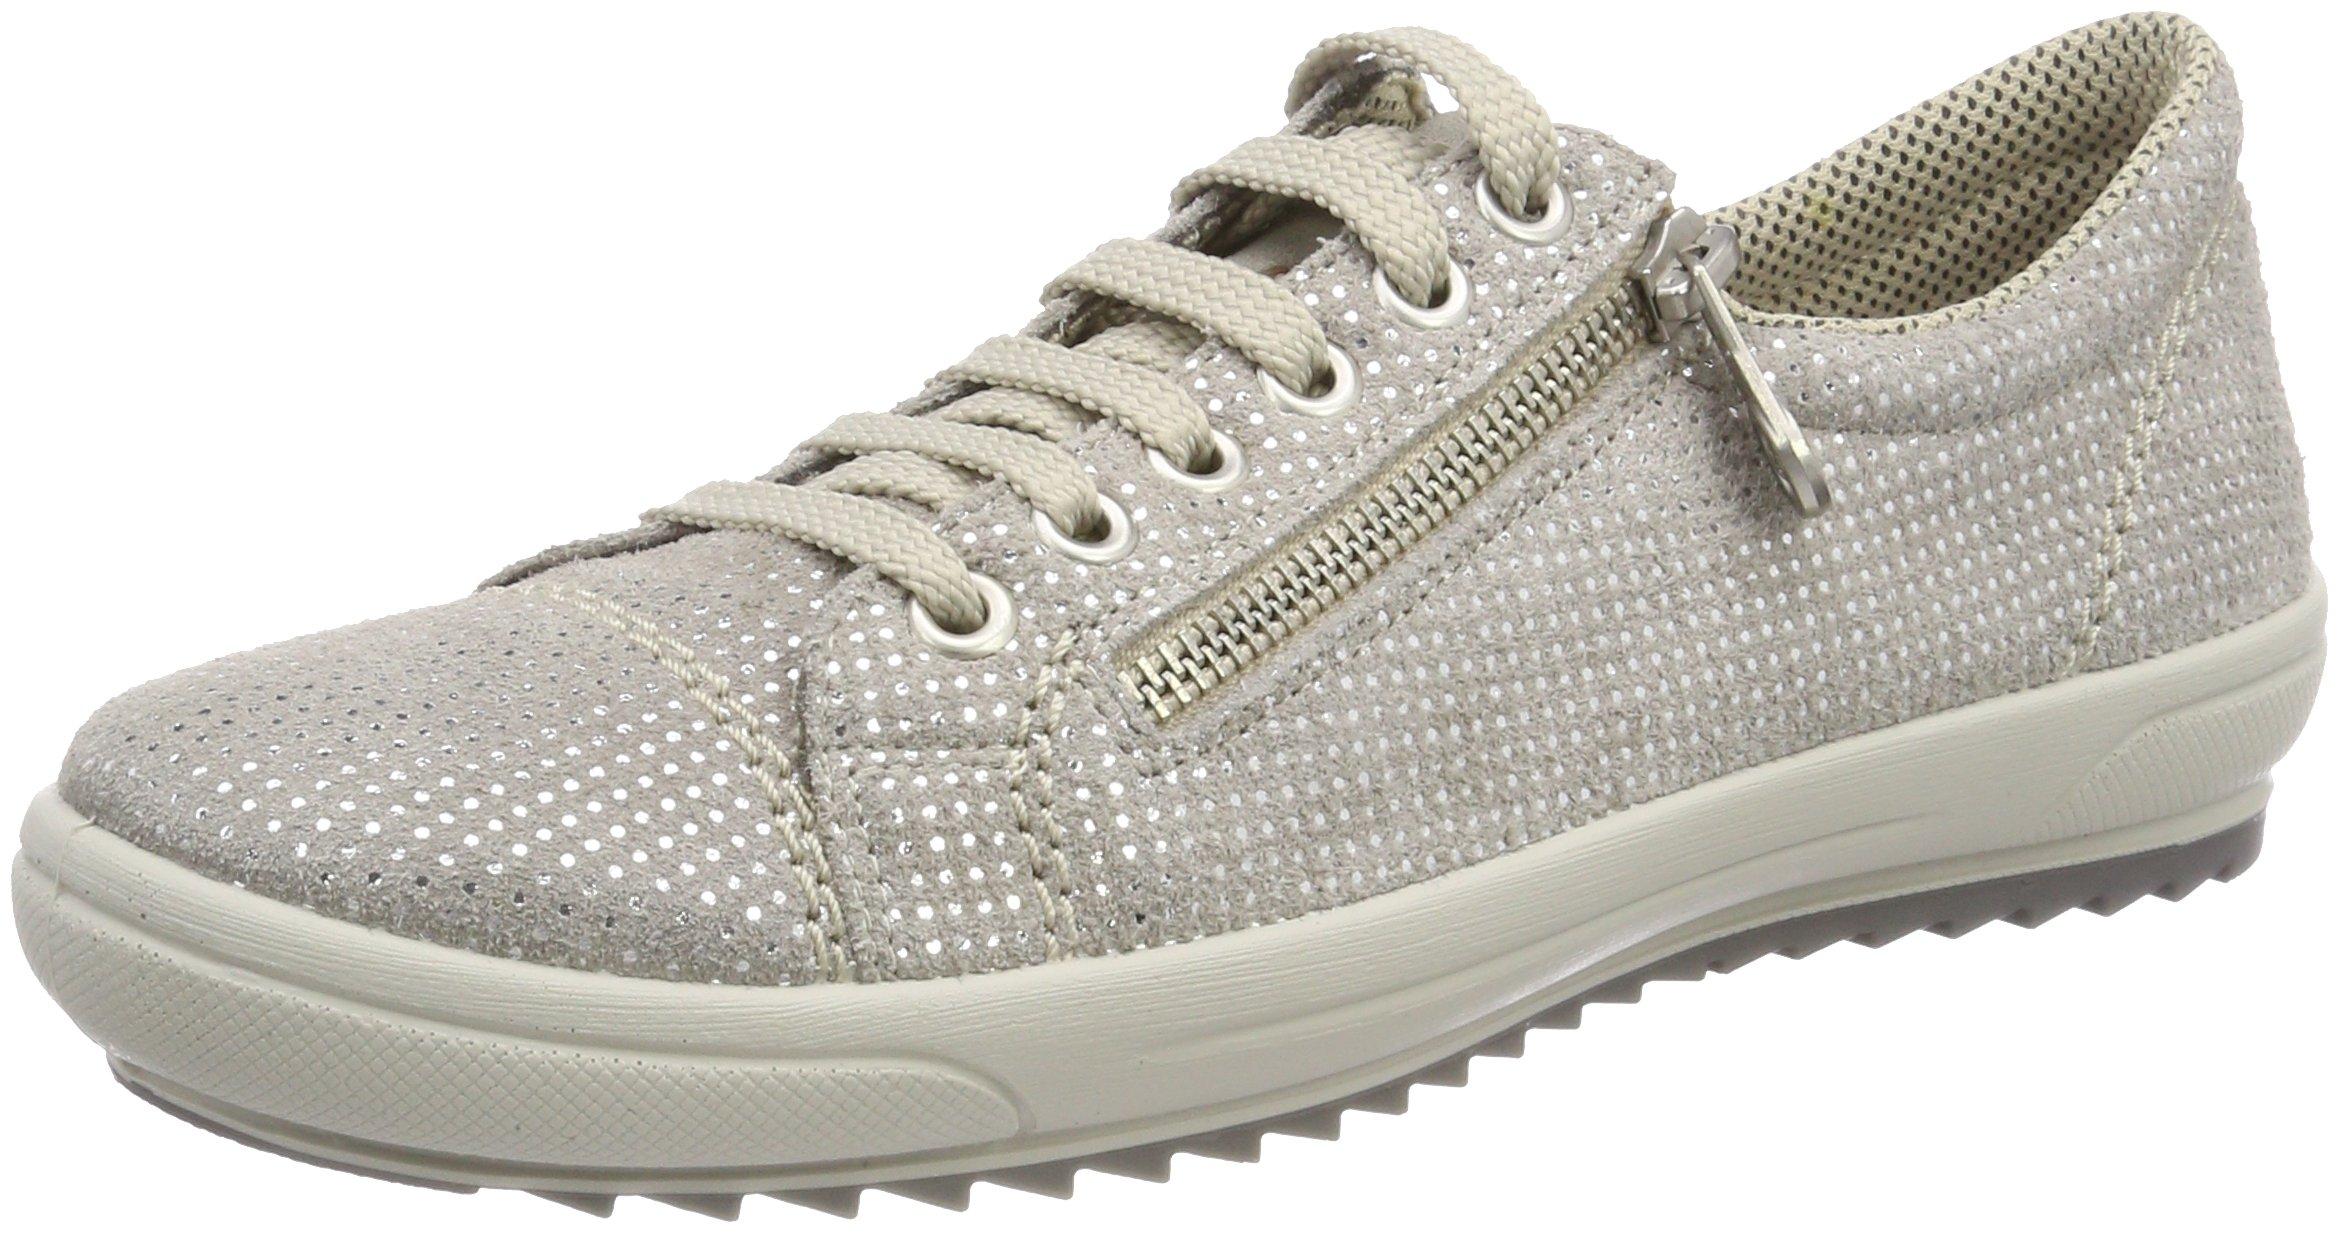 Rieker Women's Pale Gray Sparkling Leather Lace Up Fashion Sneaker UK 4 - EU 37 - US 6